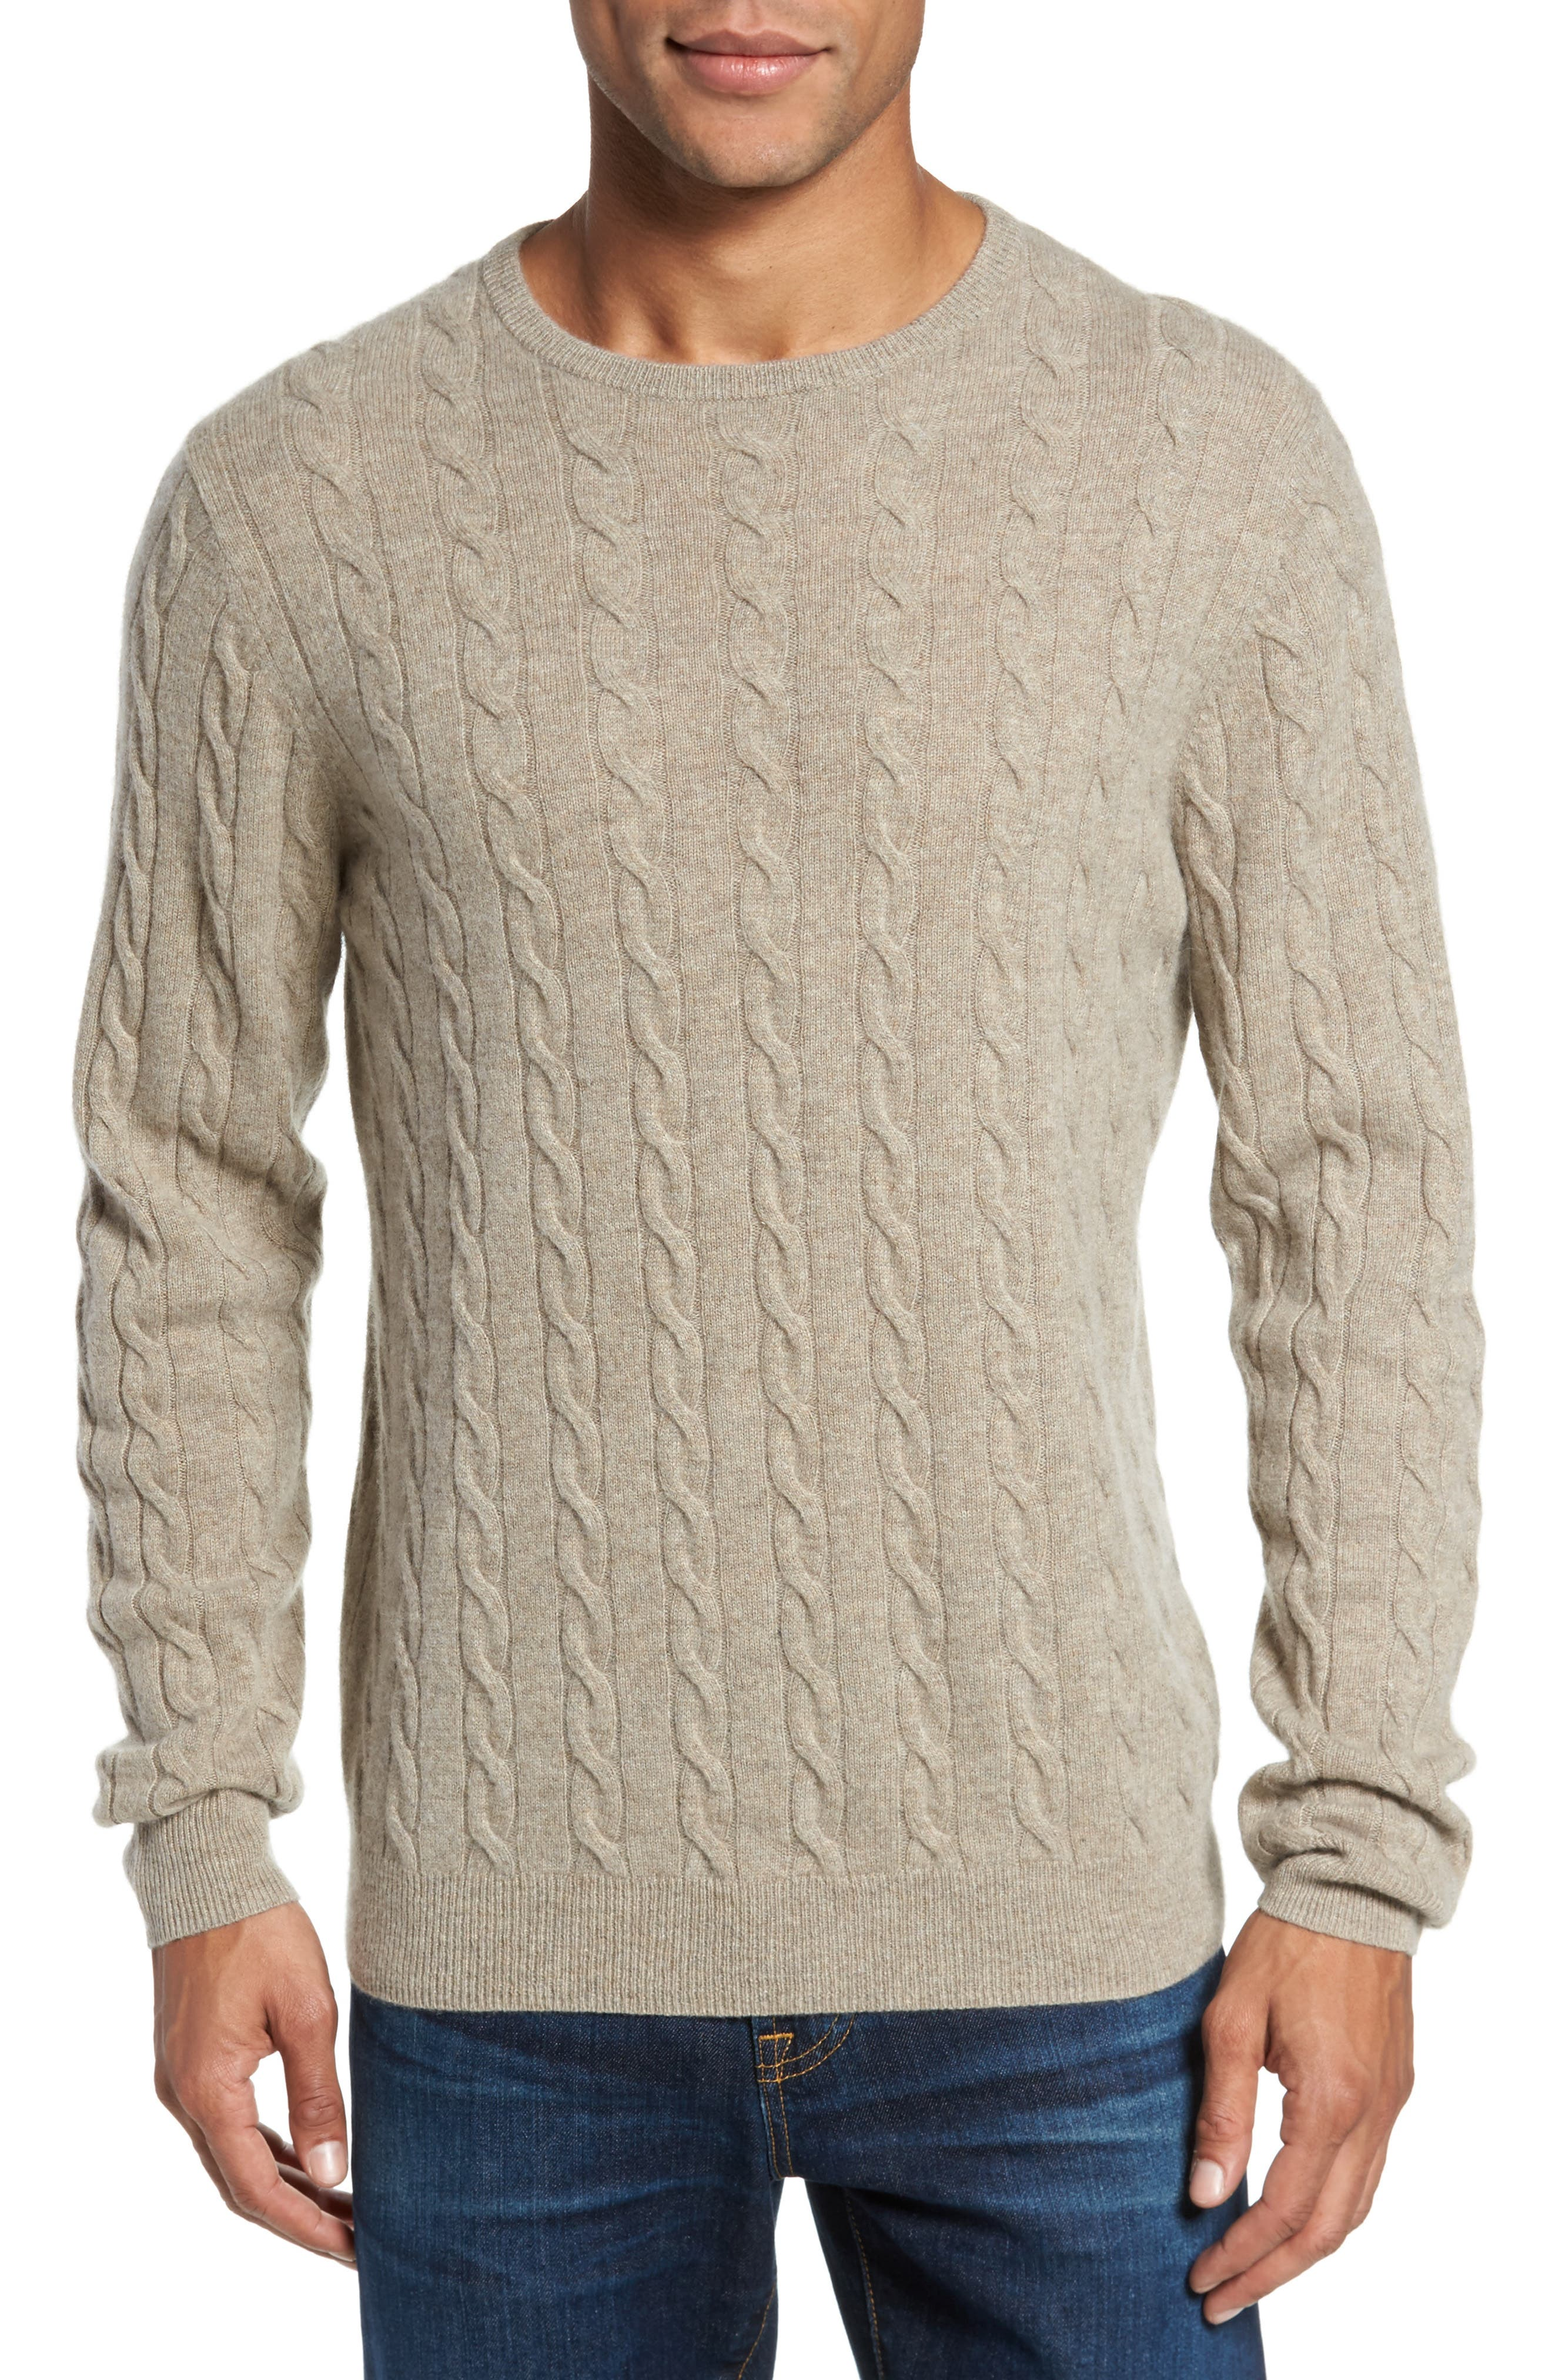 Main Image - Nordstrom Men's Shop Cashmere Cable Knit Sweater